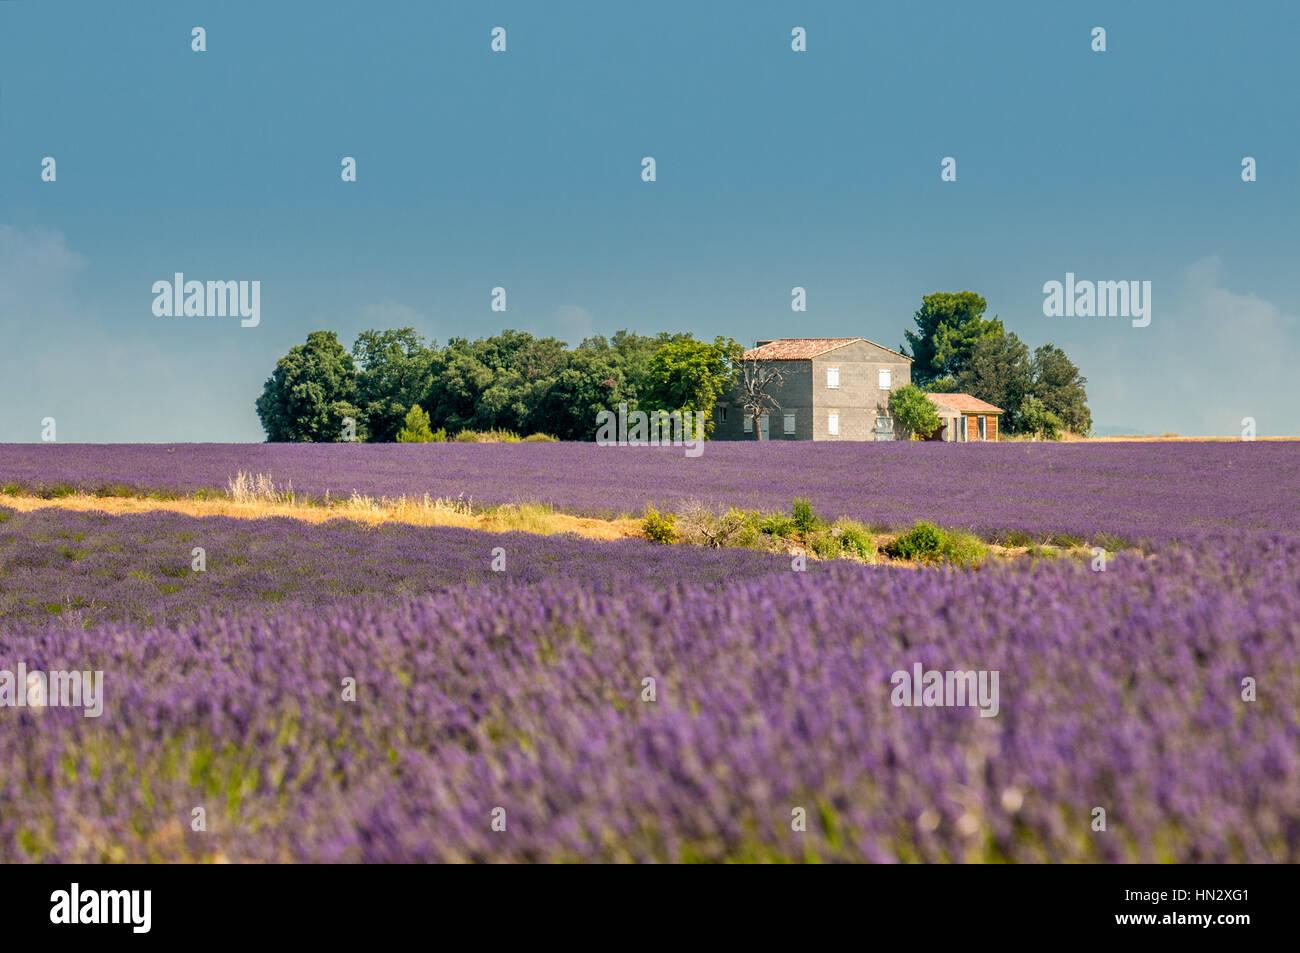 Lavender field, Provence, France Stock Photo